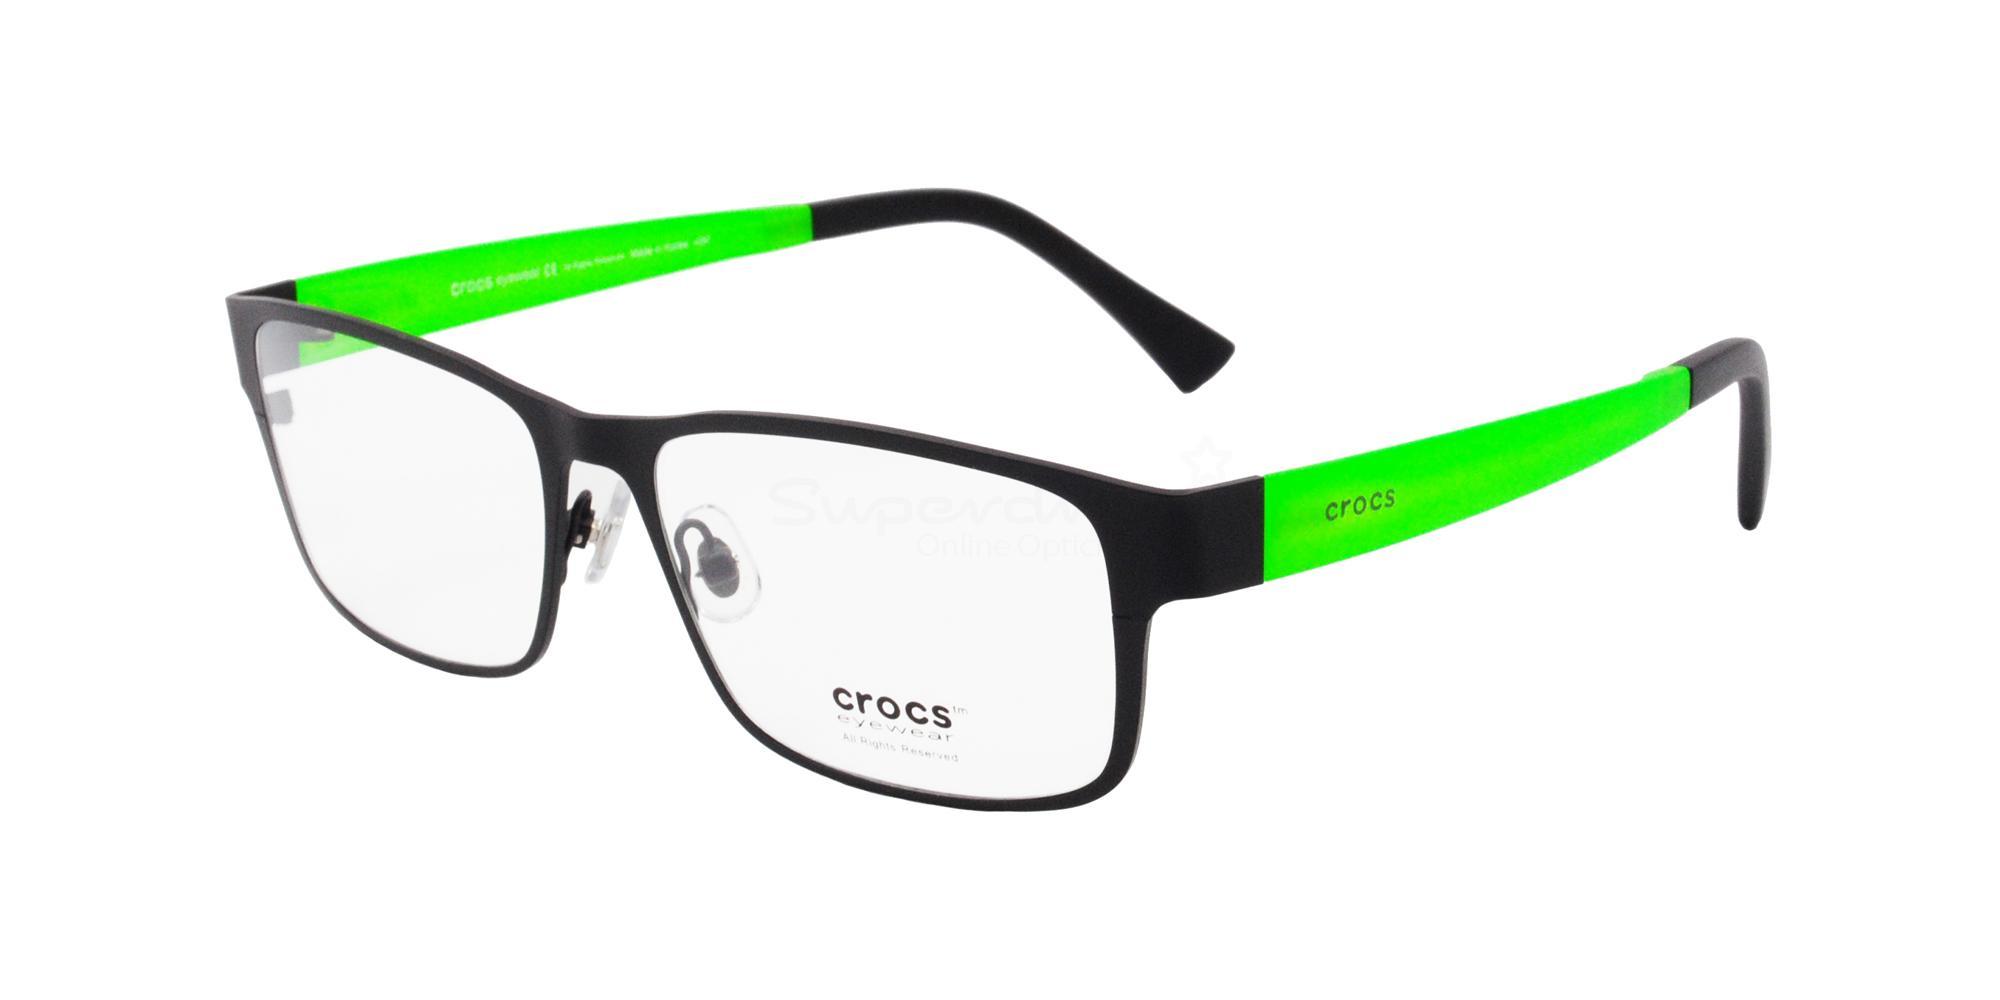 20GN CF645 Glasses, Crocs Eyewear